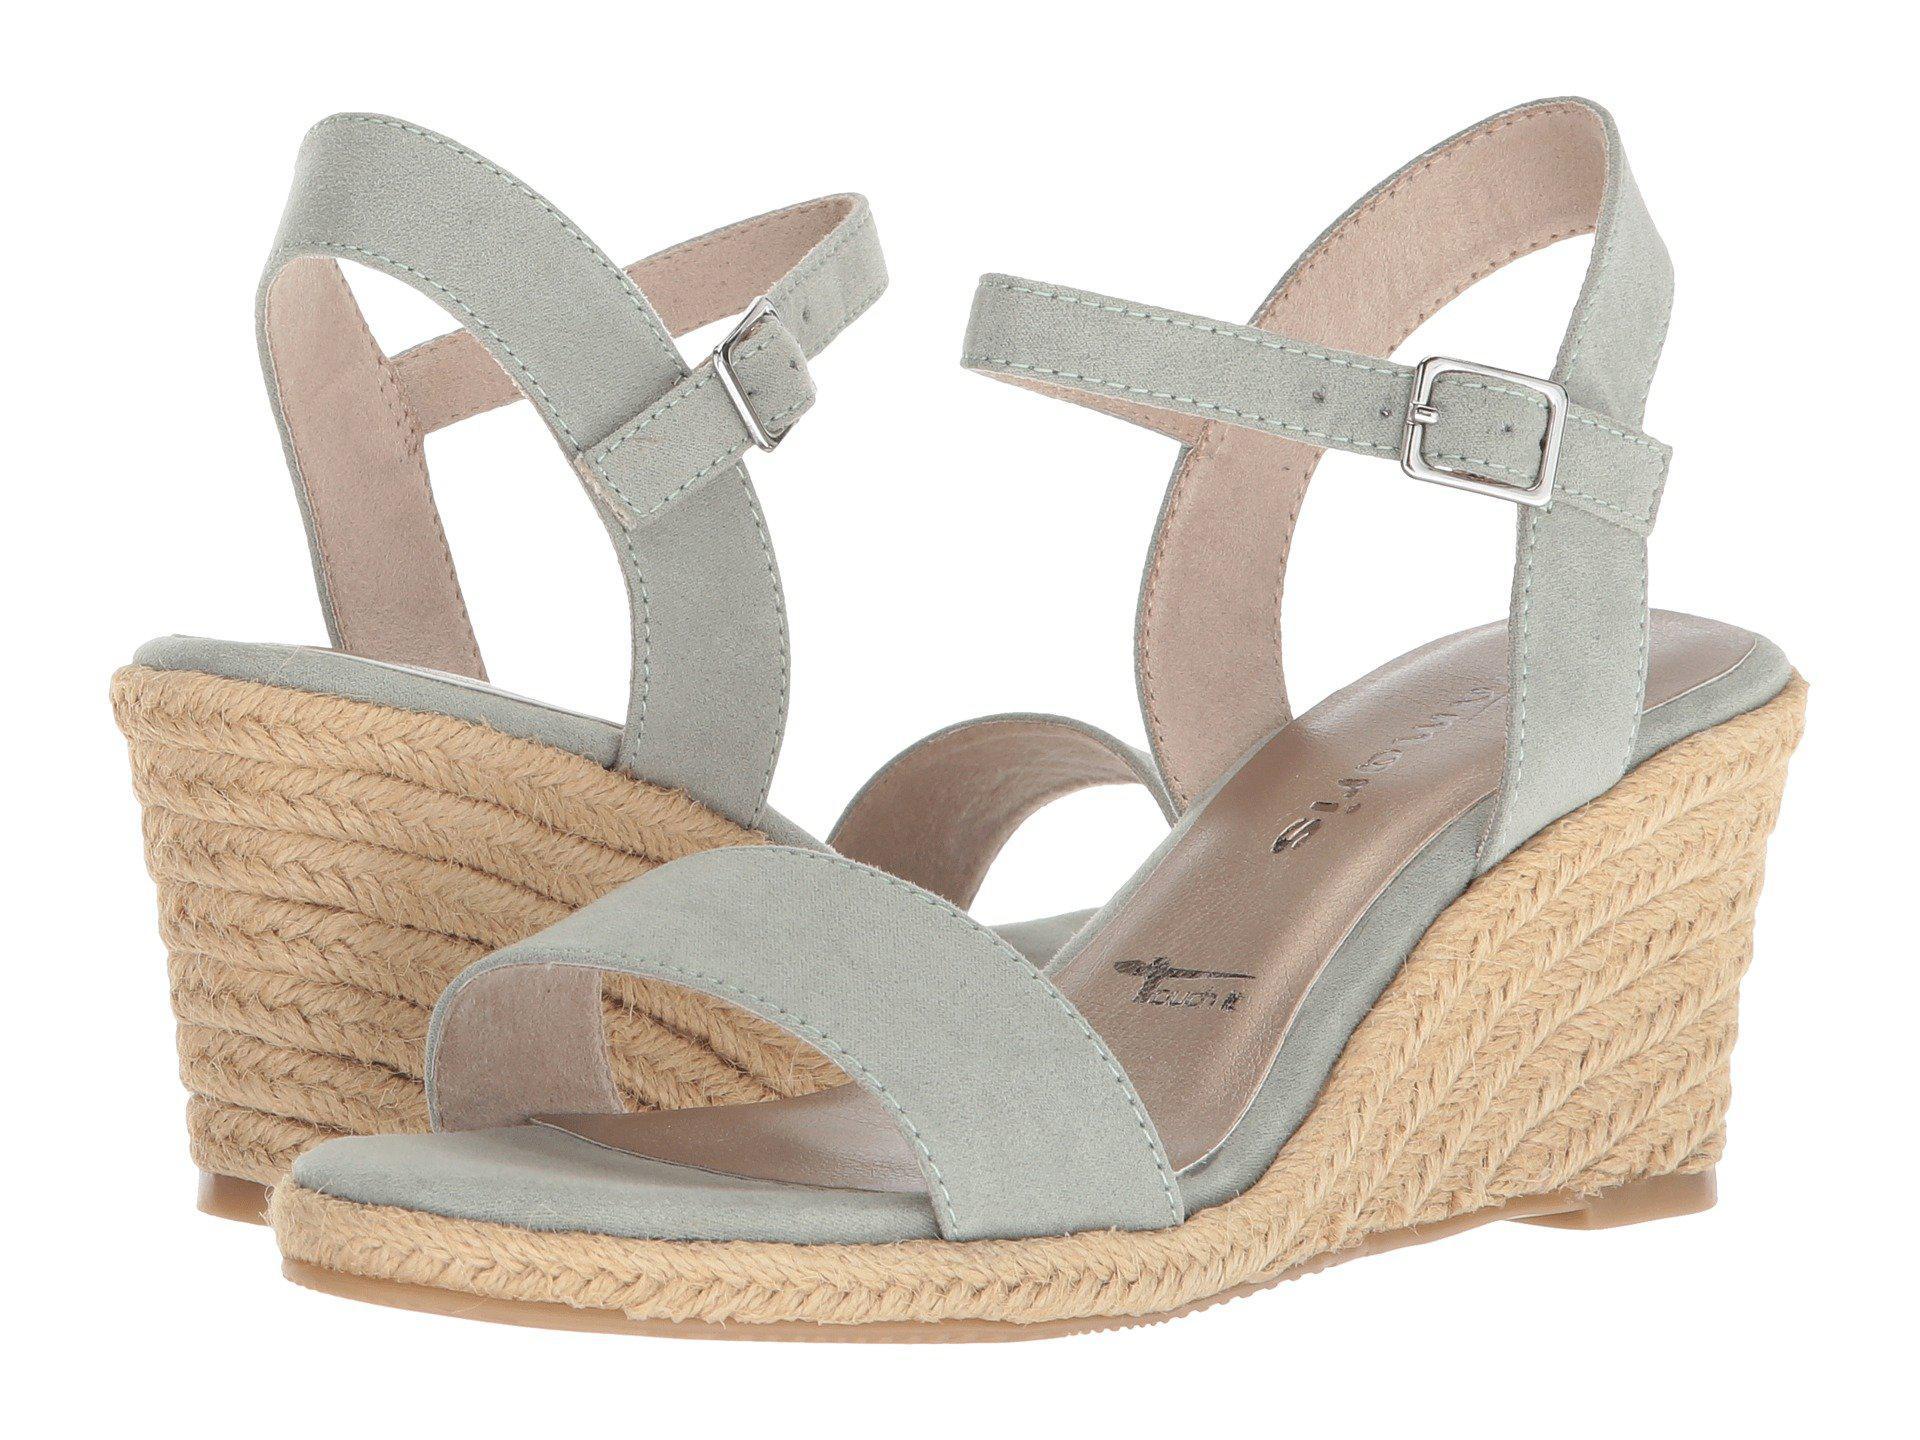 59b91acef56 Lyst - Tamaris Livia 1-1-28300-20 (pistacchio) Women s Sling Back Shoes